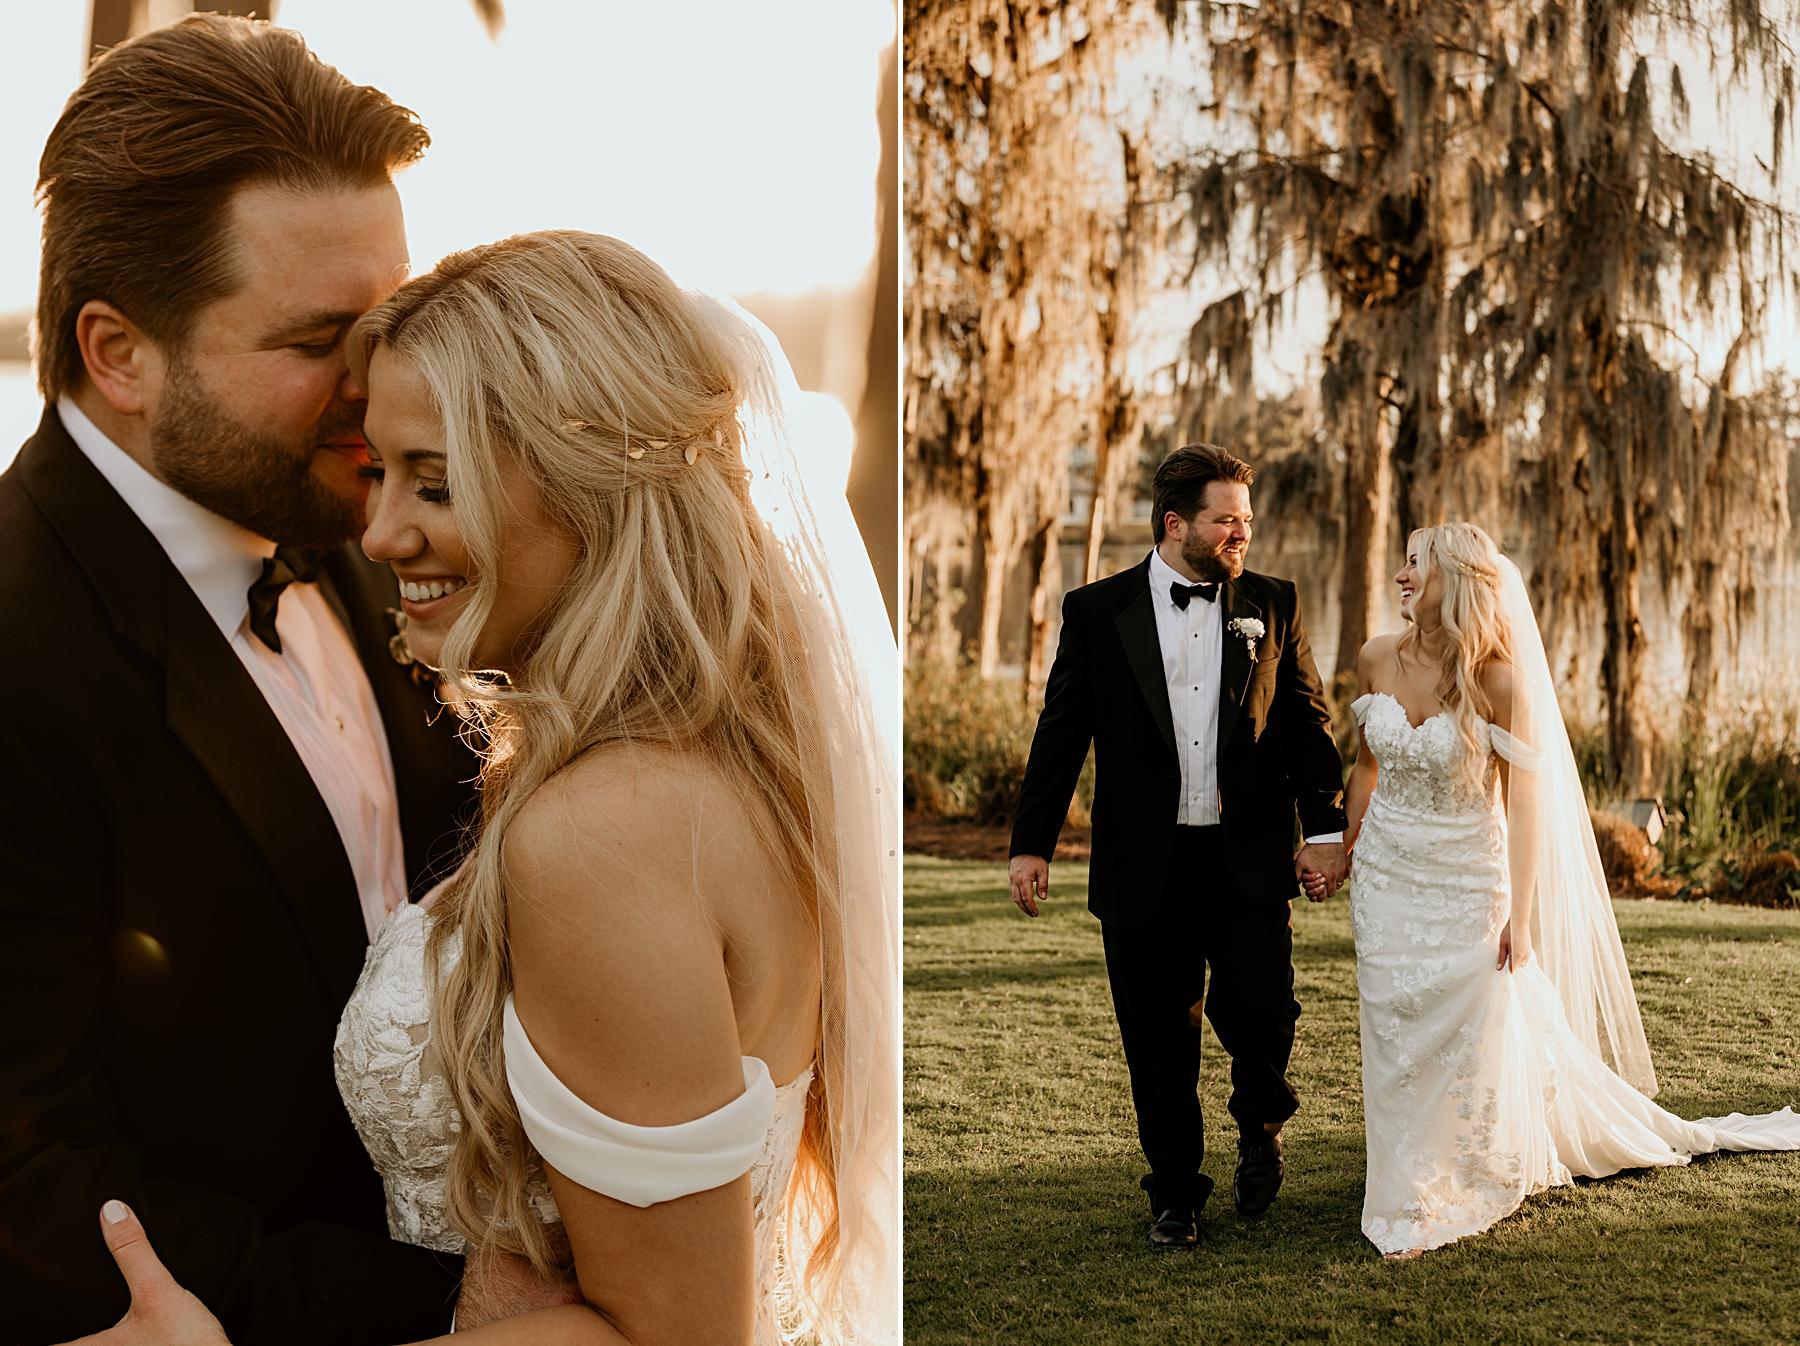 isleworth-wedding-54.jpg